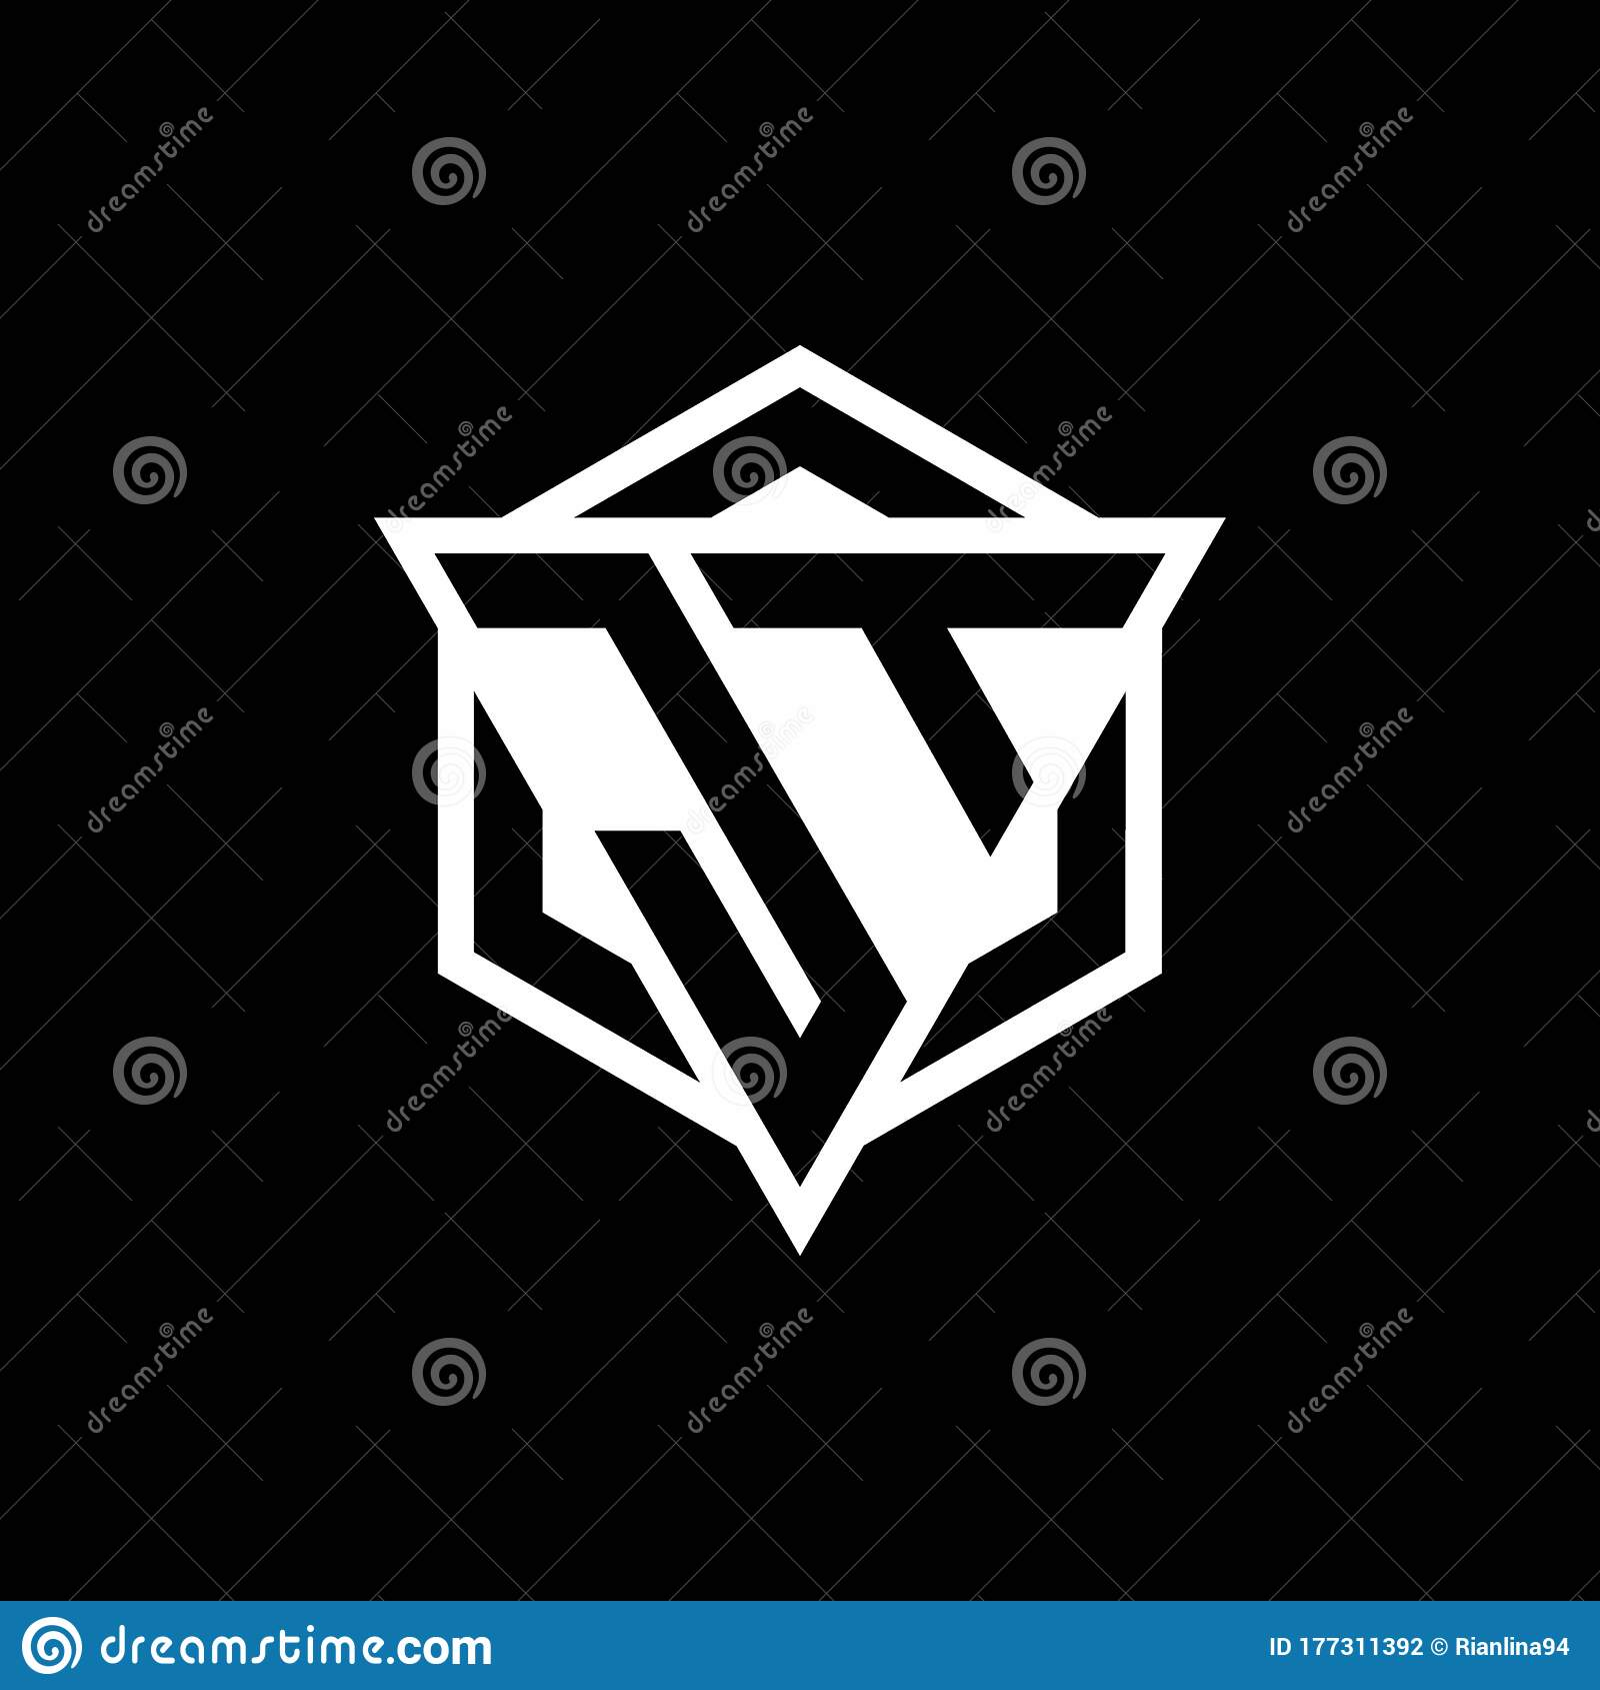 Monogram Hexagon Stock Illustrations 13 391 Monogram Hexagon Stock Illustrations Vectors Clipart Dreamstime